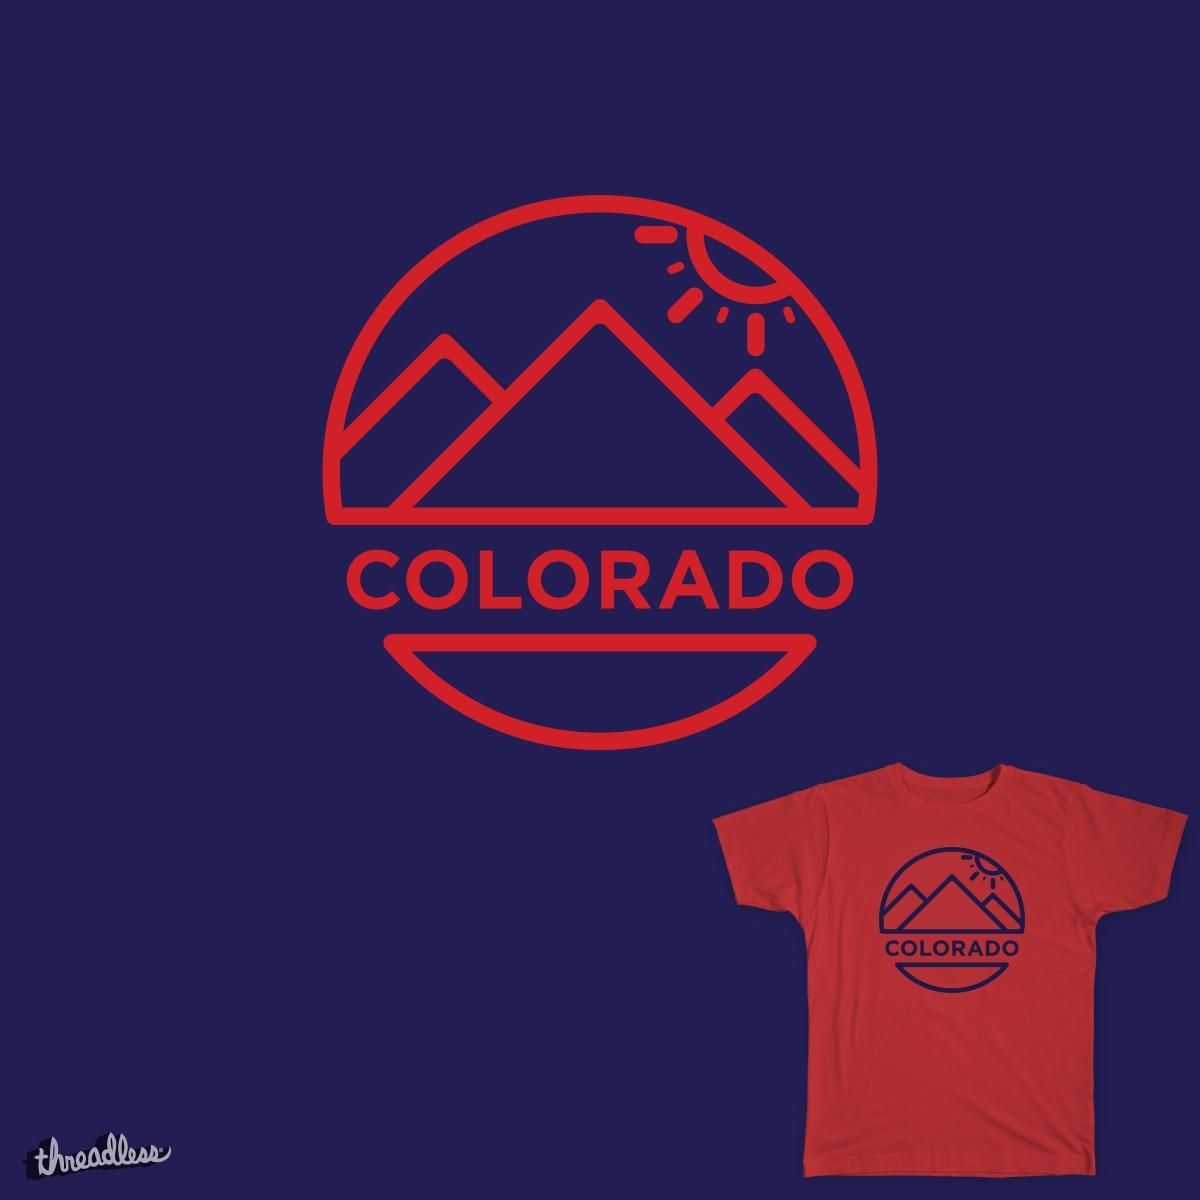 Colorado by bmaw on Threadless